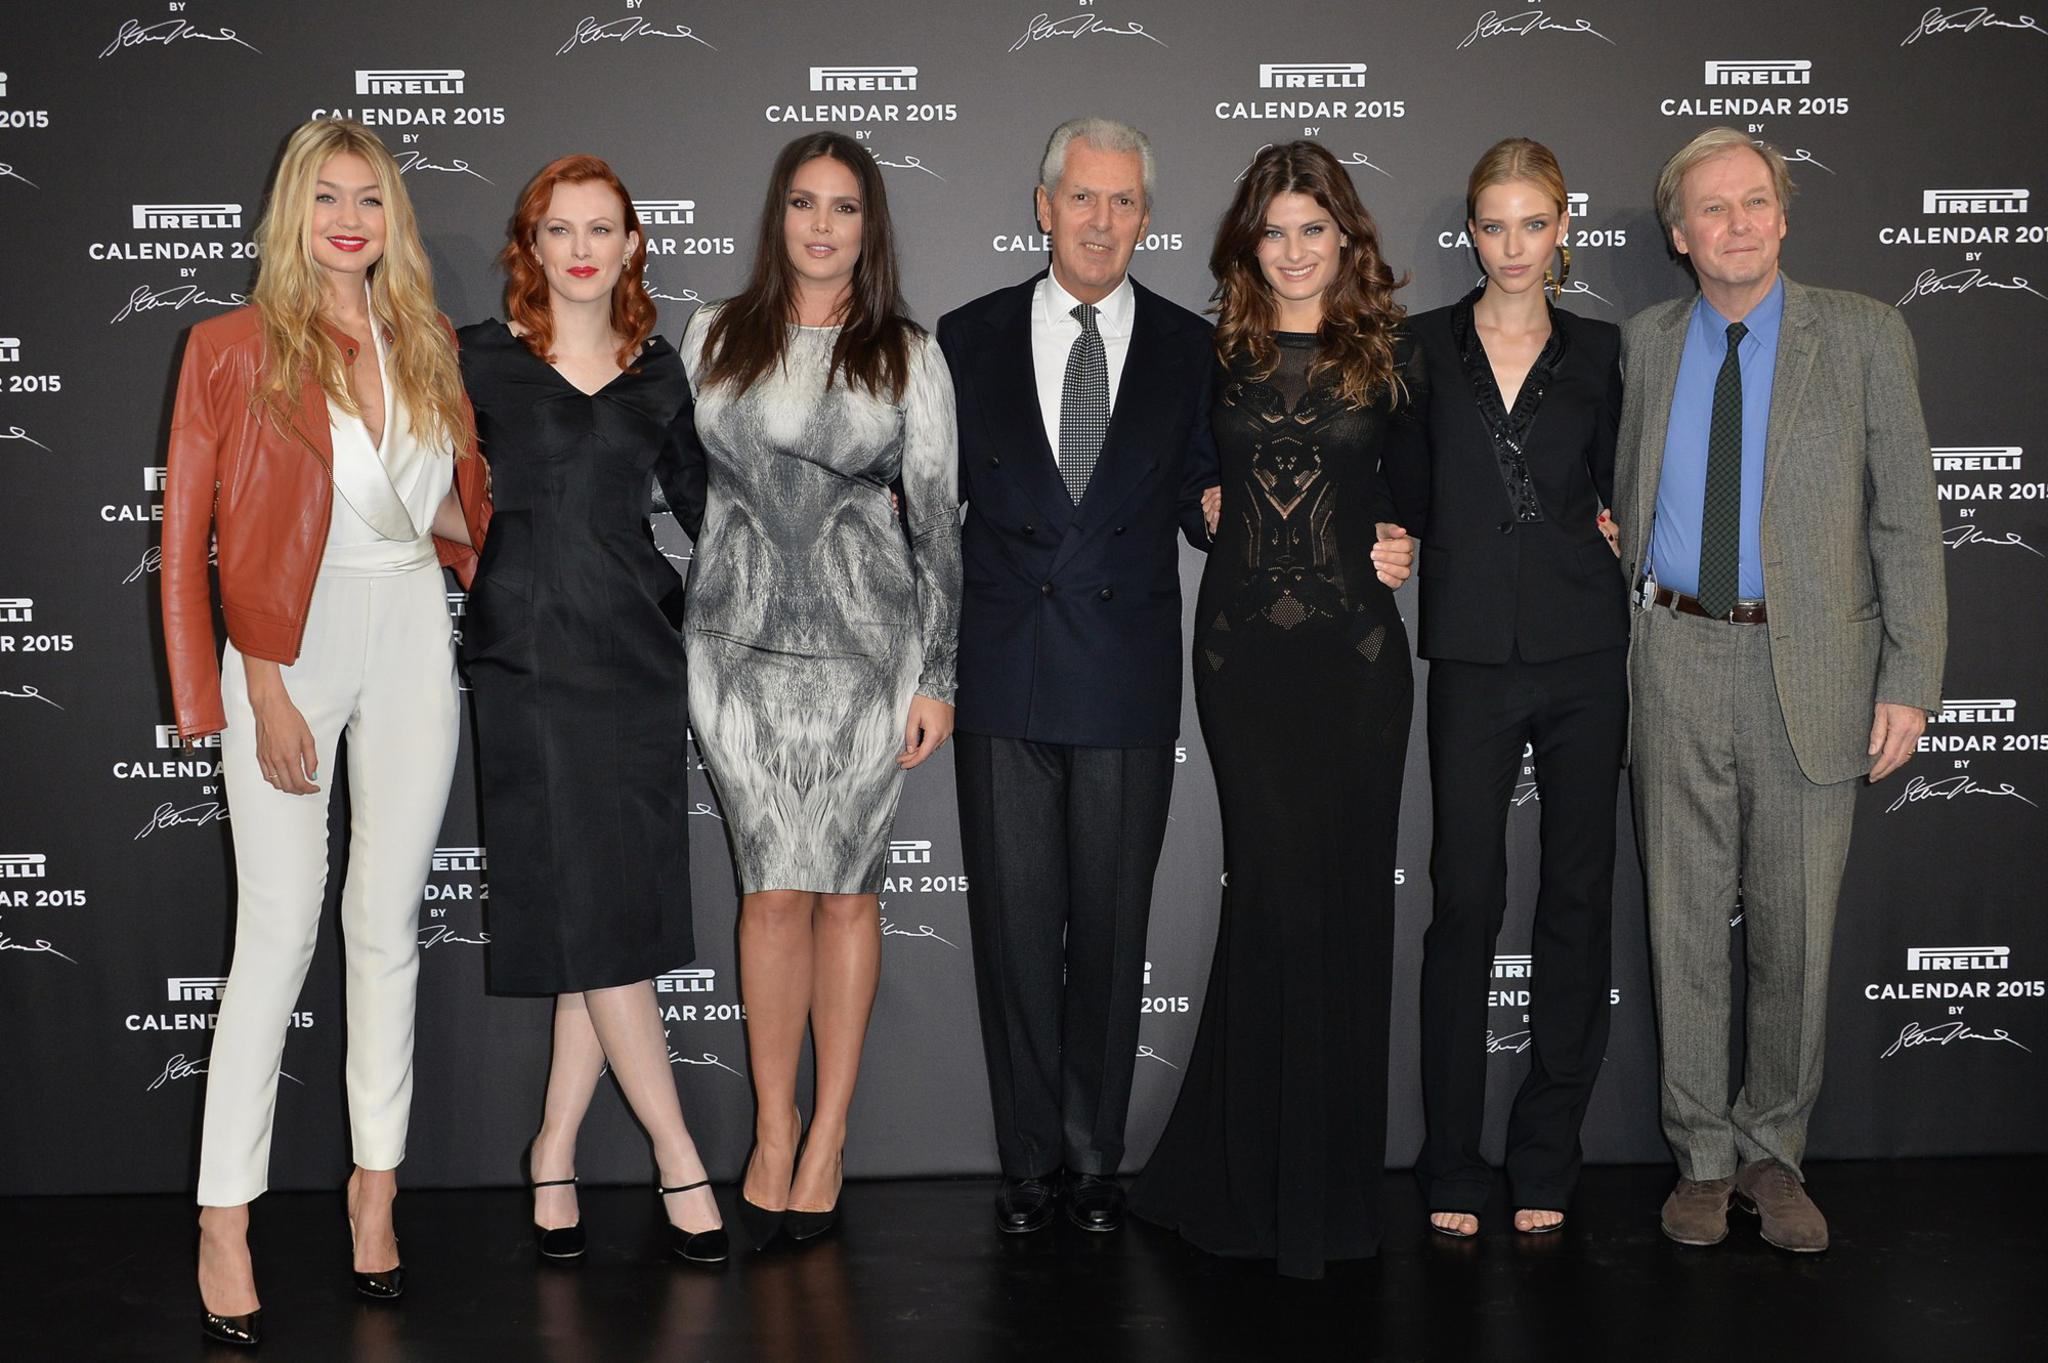 Gigi Hadid, Karen Elson, Candice Huffine, Marco Tronchetti Provera, Isabeli Fontana, Sasha Luss e Jimmy Moffat